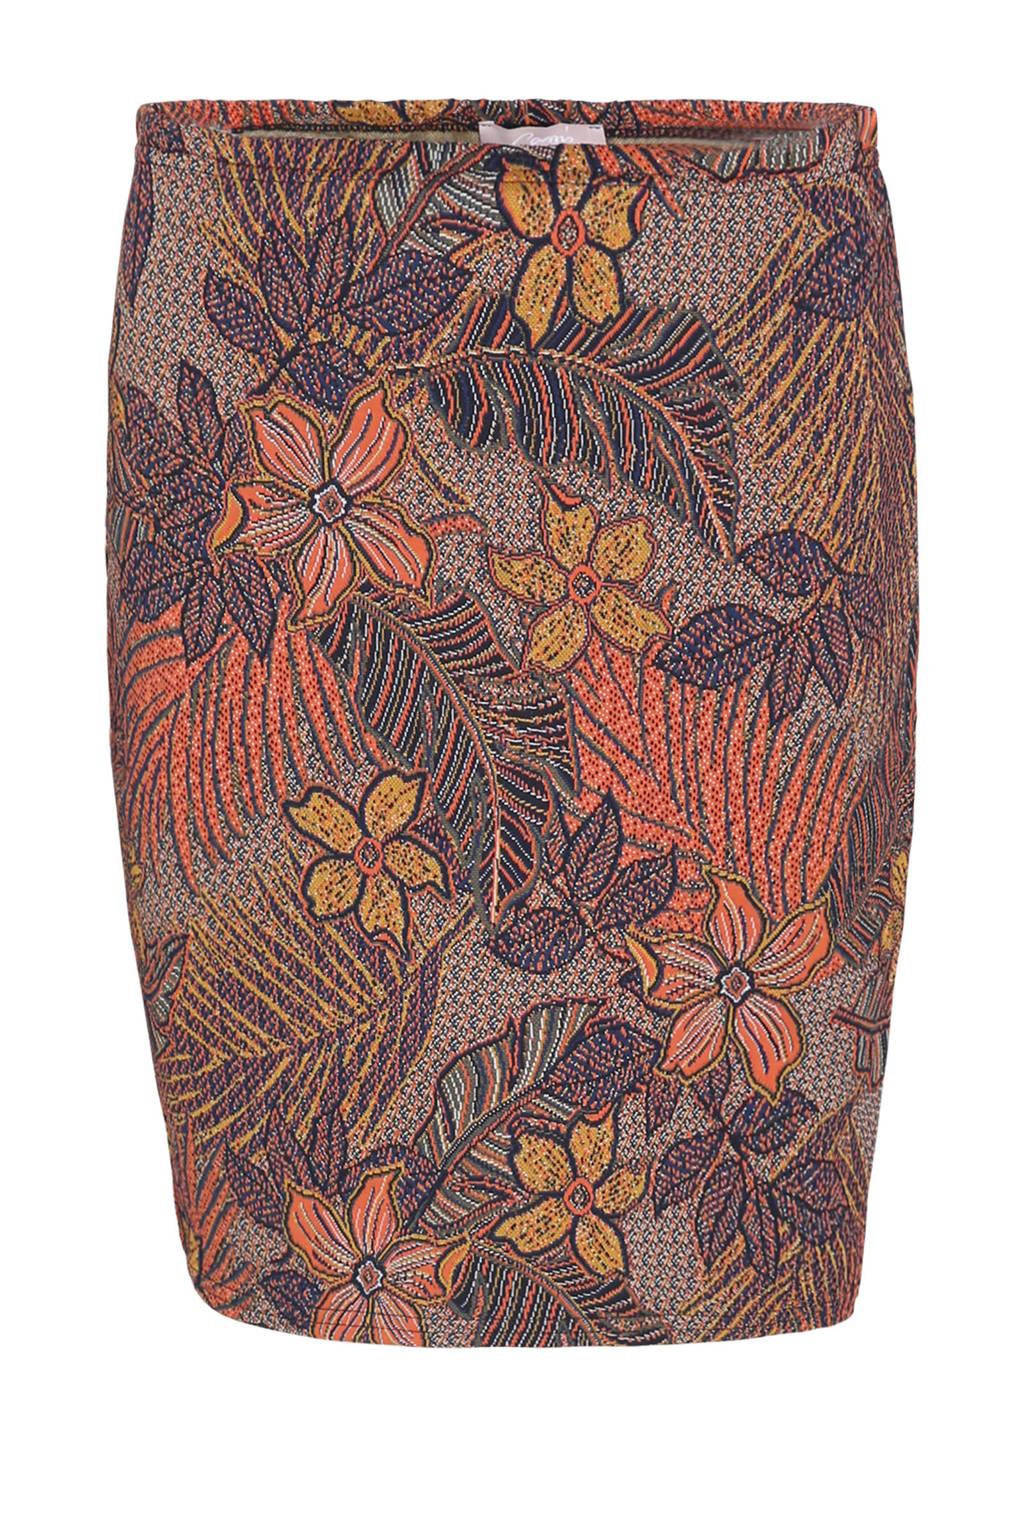 Cassis rok met all over print en borduursels paars/koraalrood/okergeel, Paars/koraalrood/okergeel